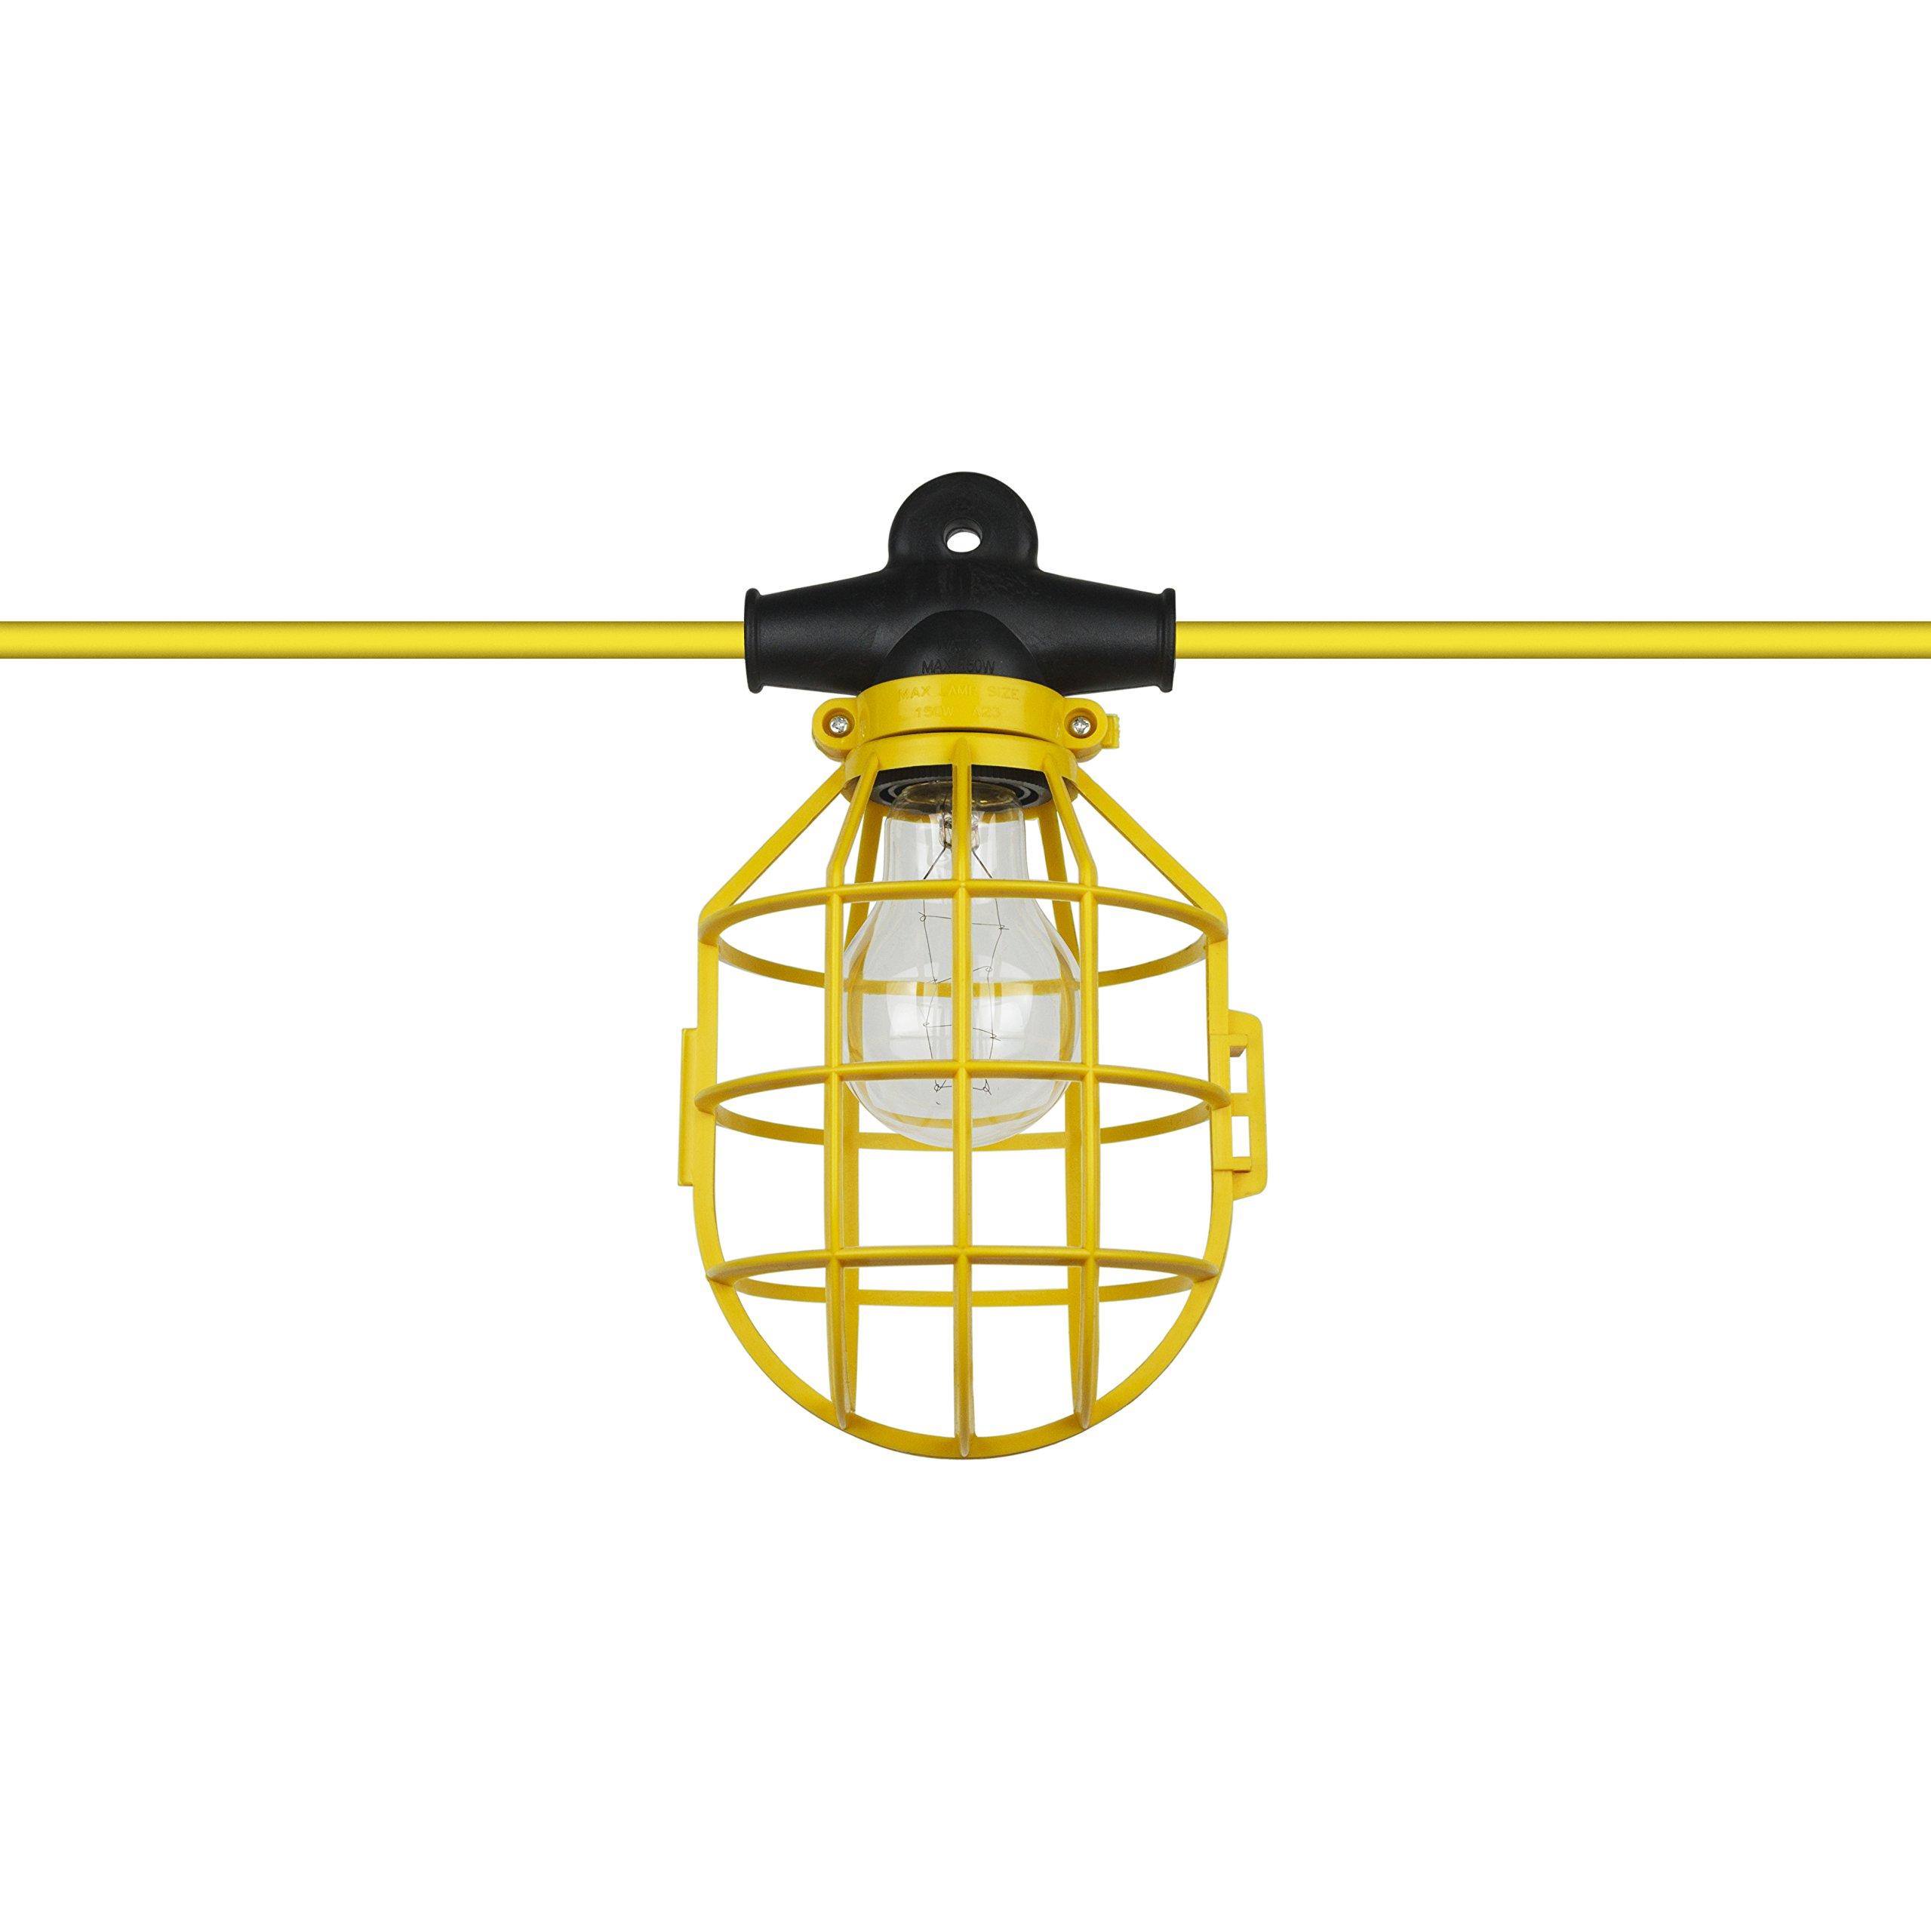 Sunlite EX50-14/2/SL Commercial-Grade Cage String, 50-Feet, 5 Medium Base Sockets (E26), Indoor, Outdoor, Construction Lighting, ETL Listed, Foot, Yellow by Sunlite